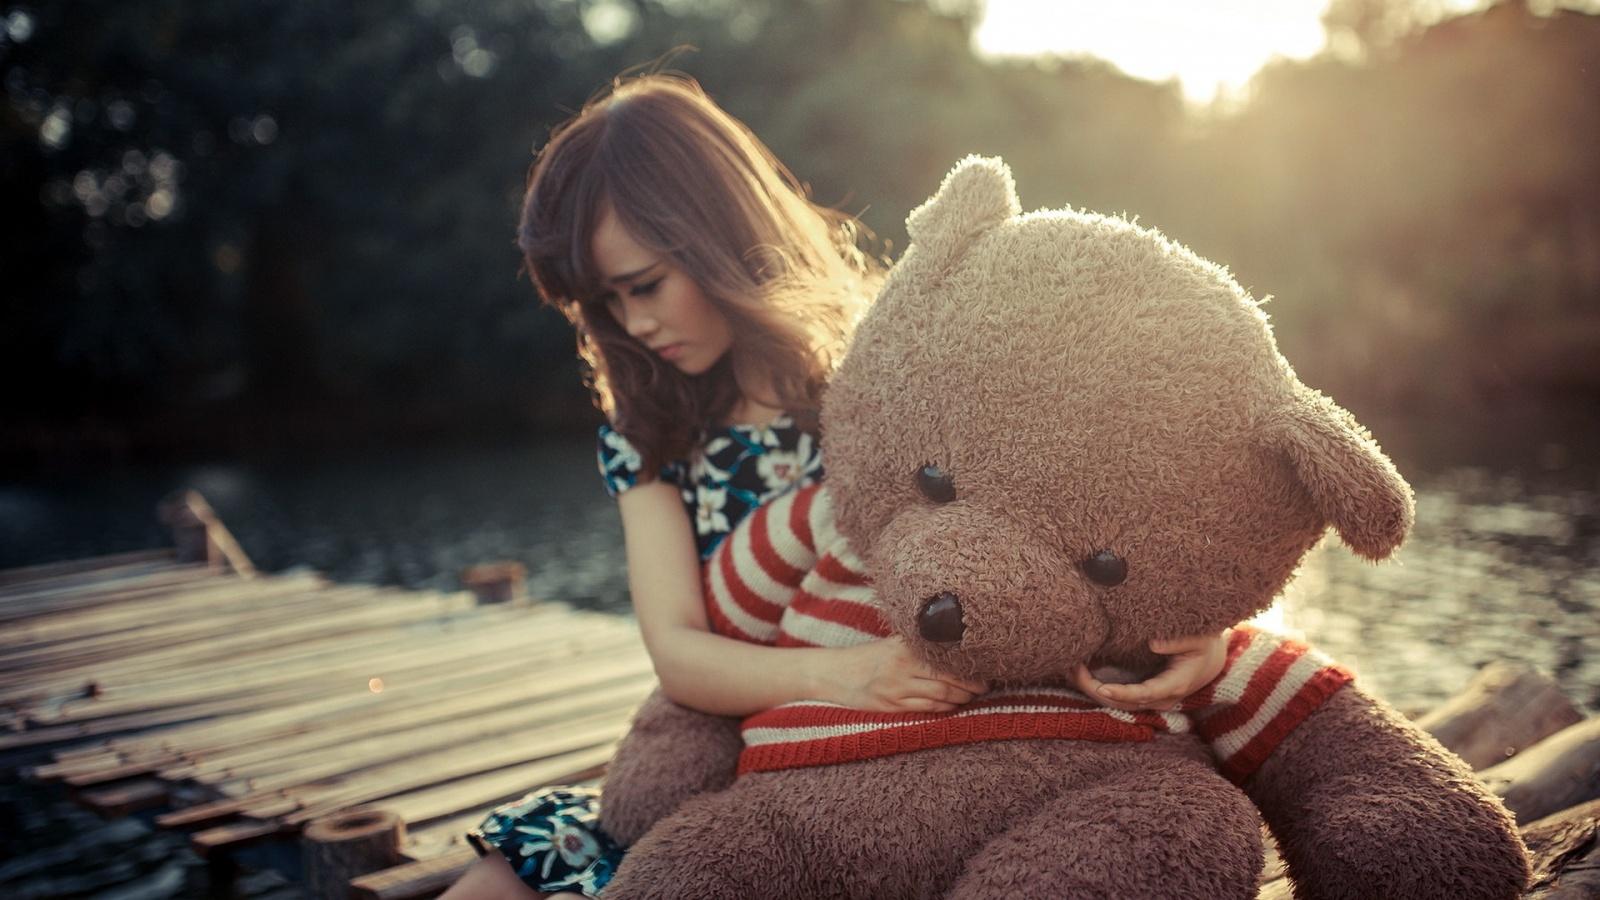 sad girl with teddy bear wallpaper